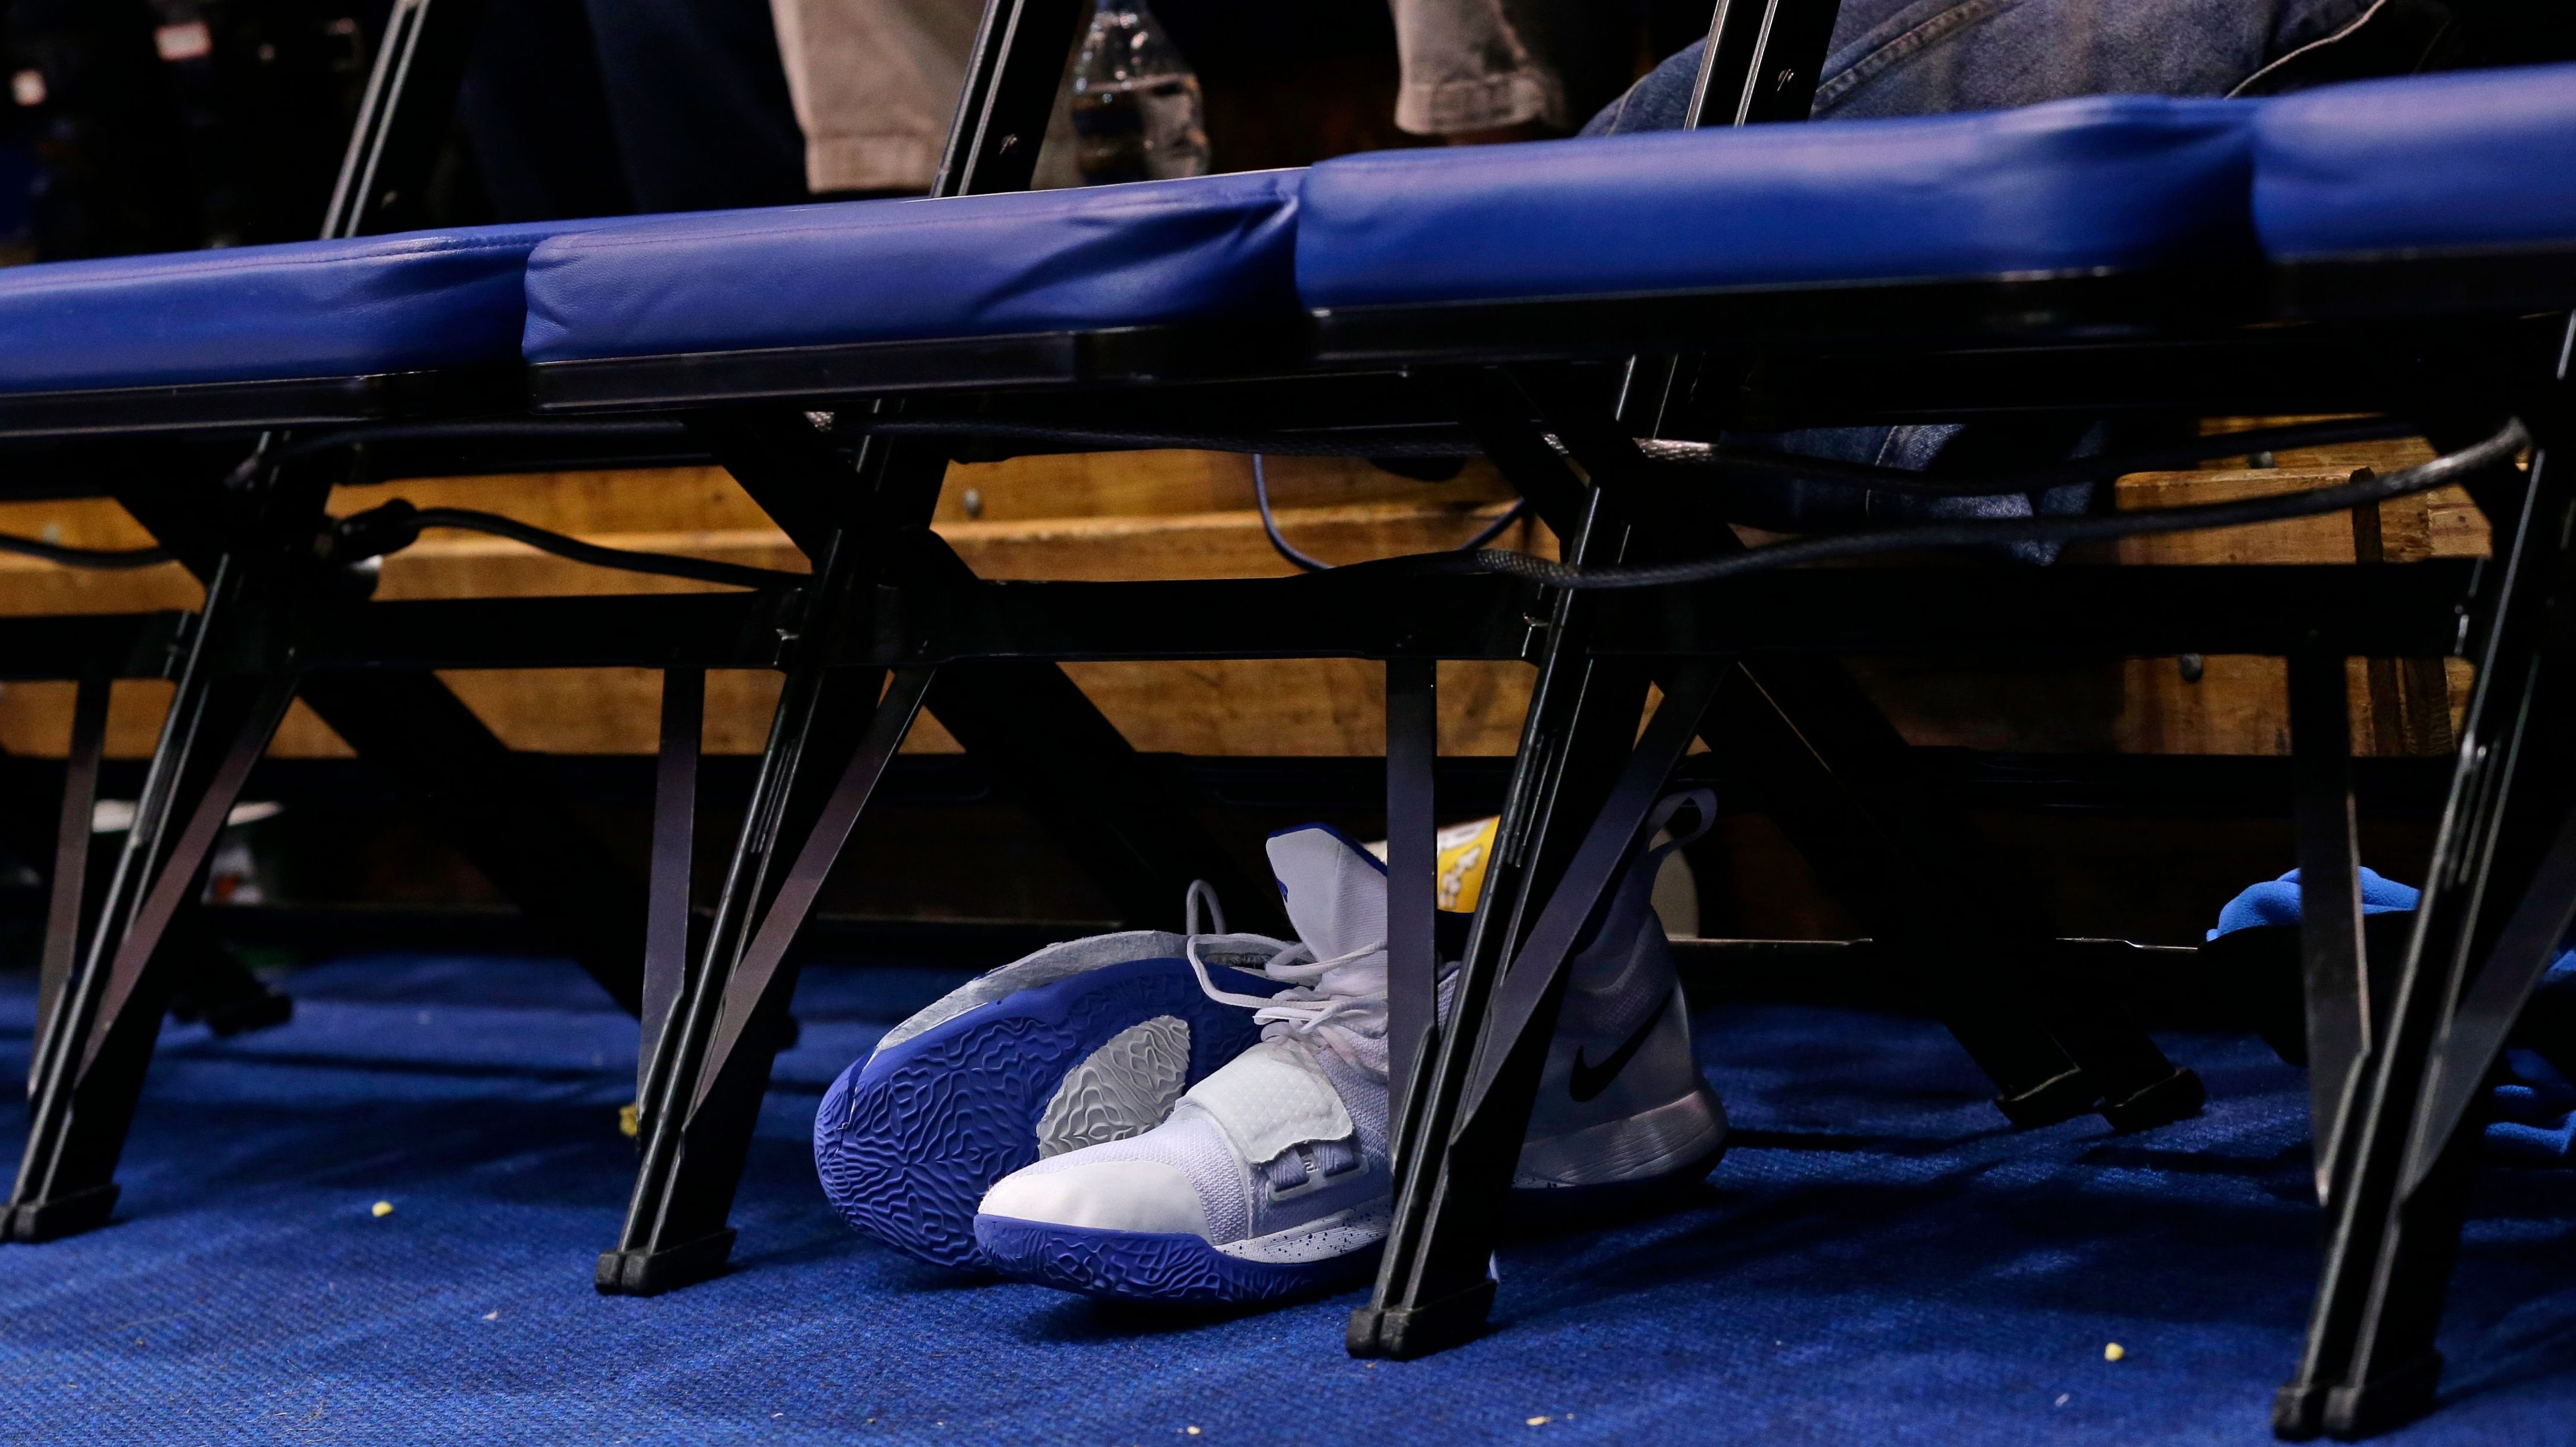 Skechers mocks Nike's PG 2.5 sneaker